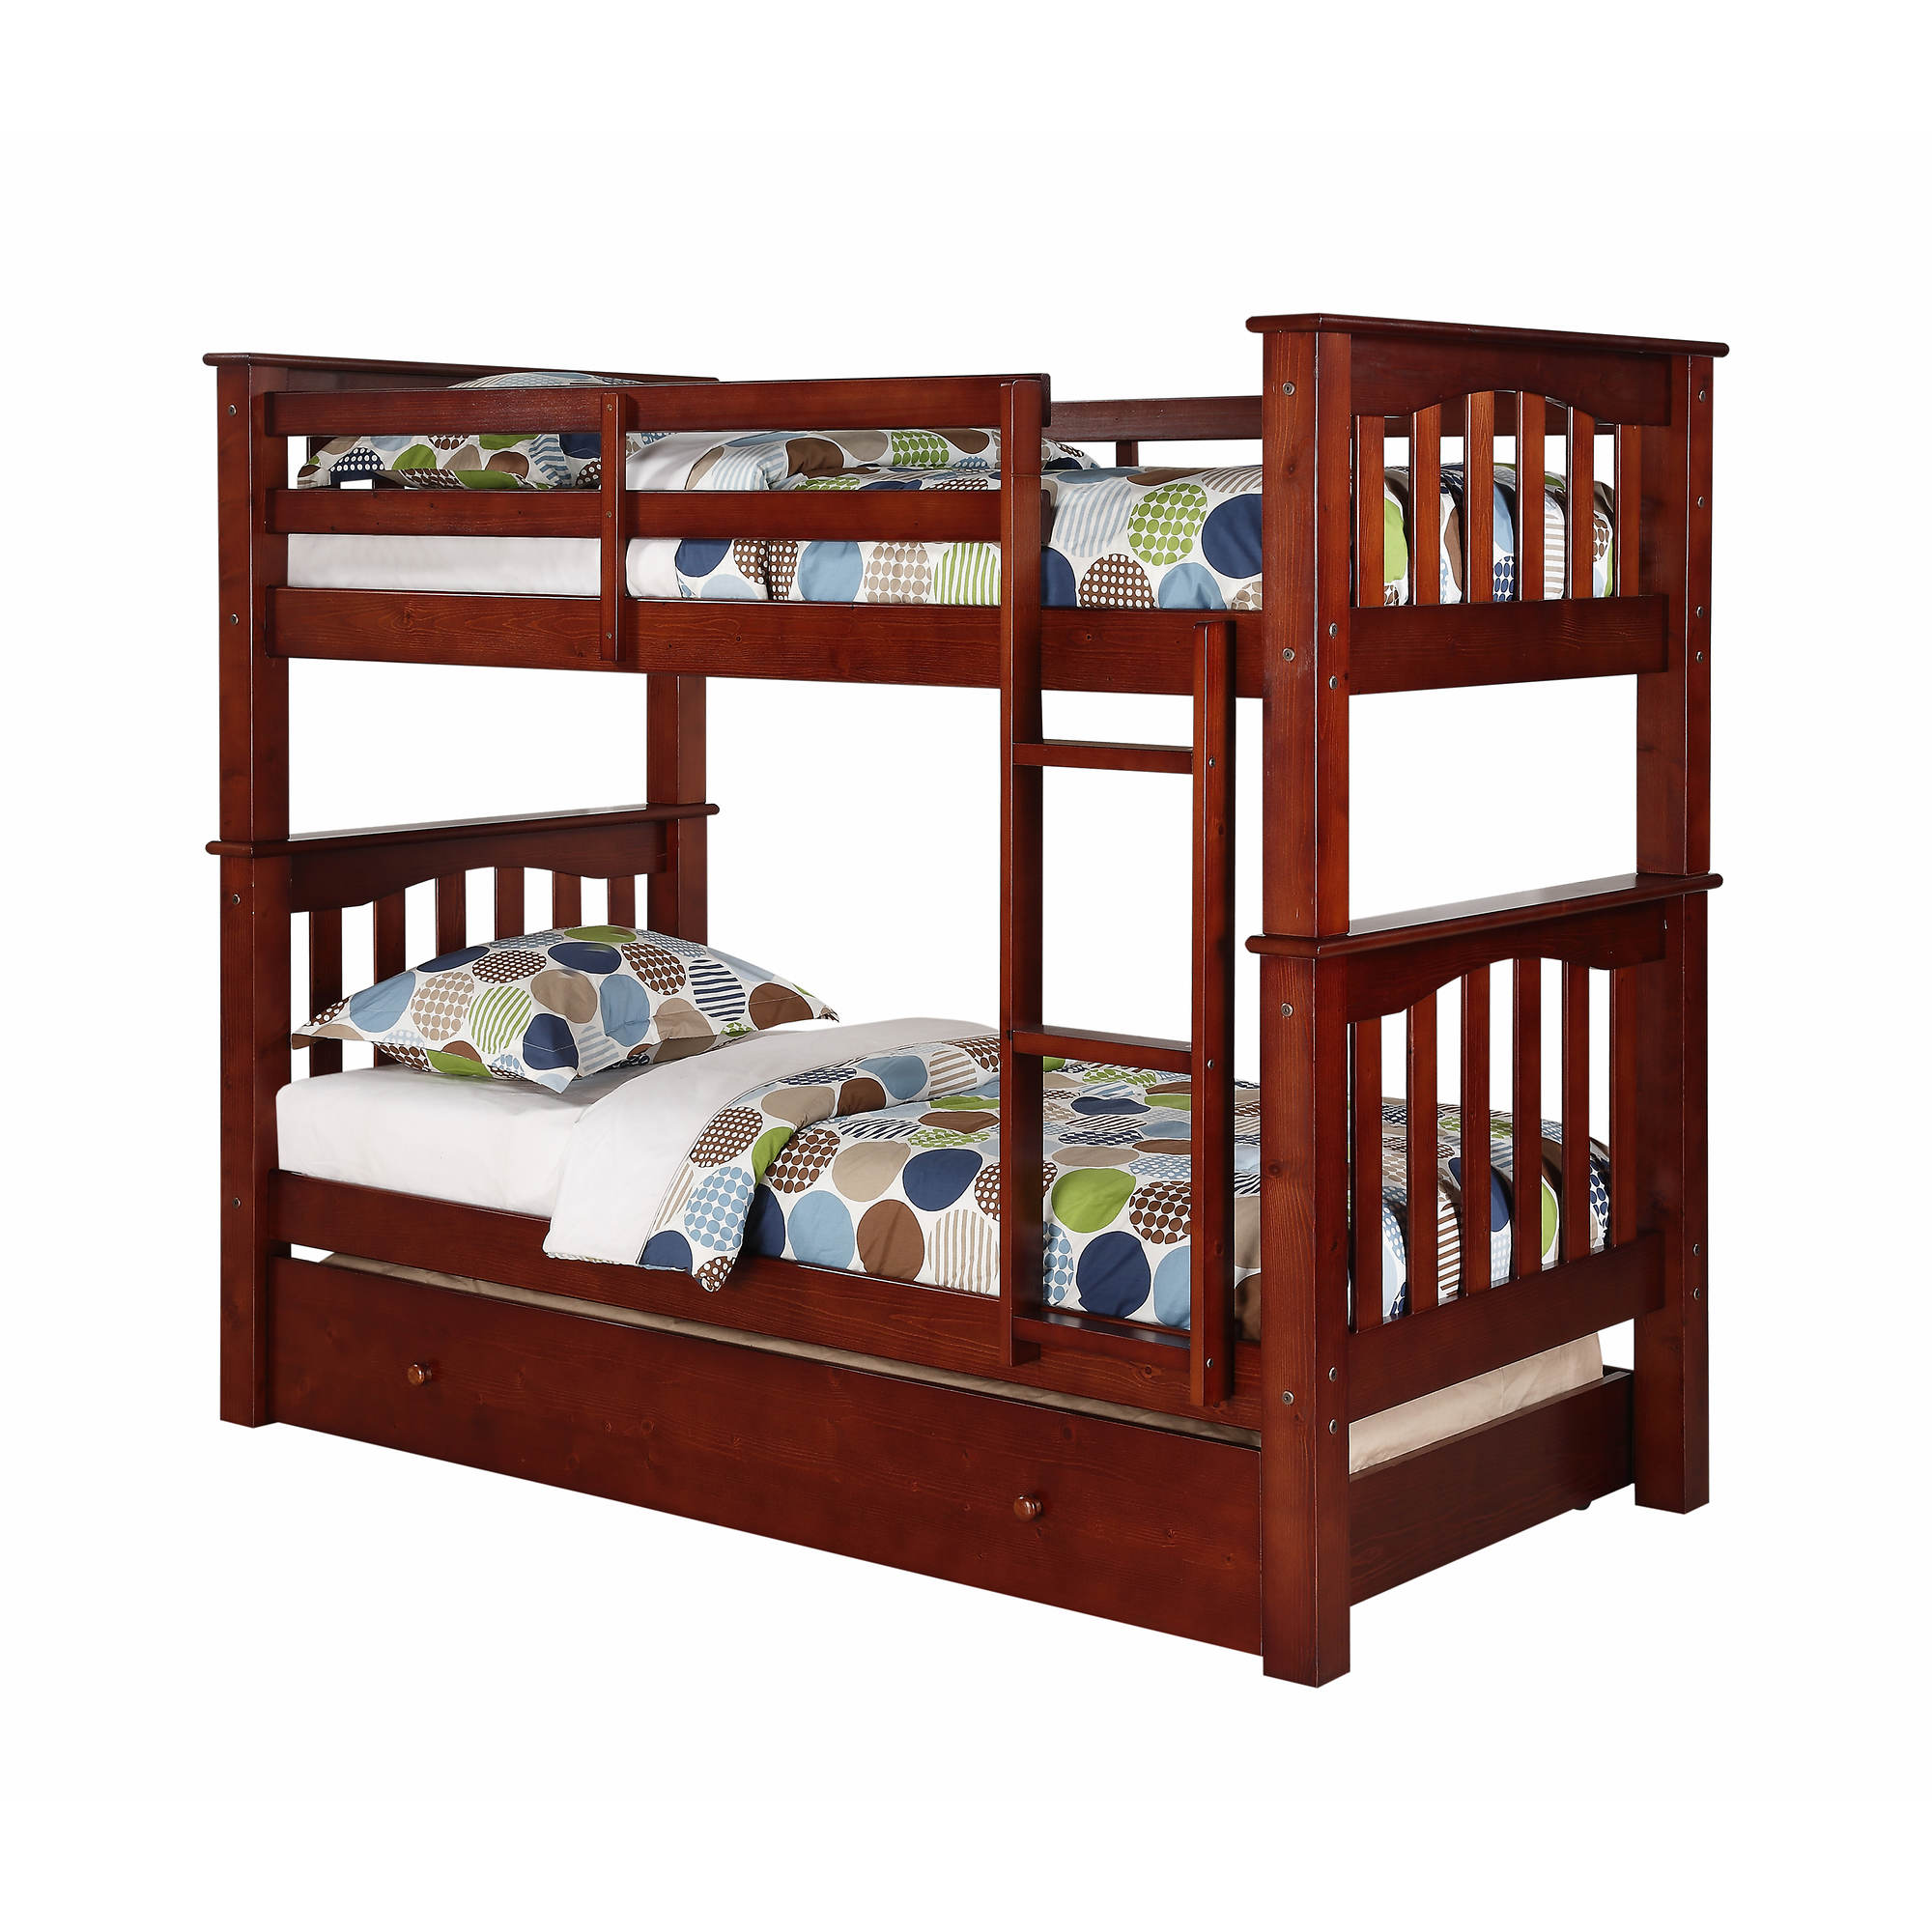 Berkley Jensen Twin Size Bunk Bed With Trundle Bjs Wholesale Club